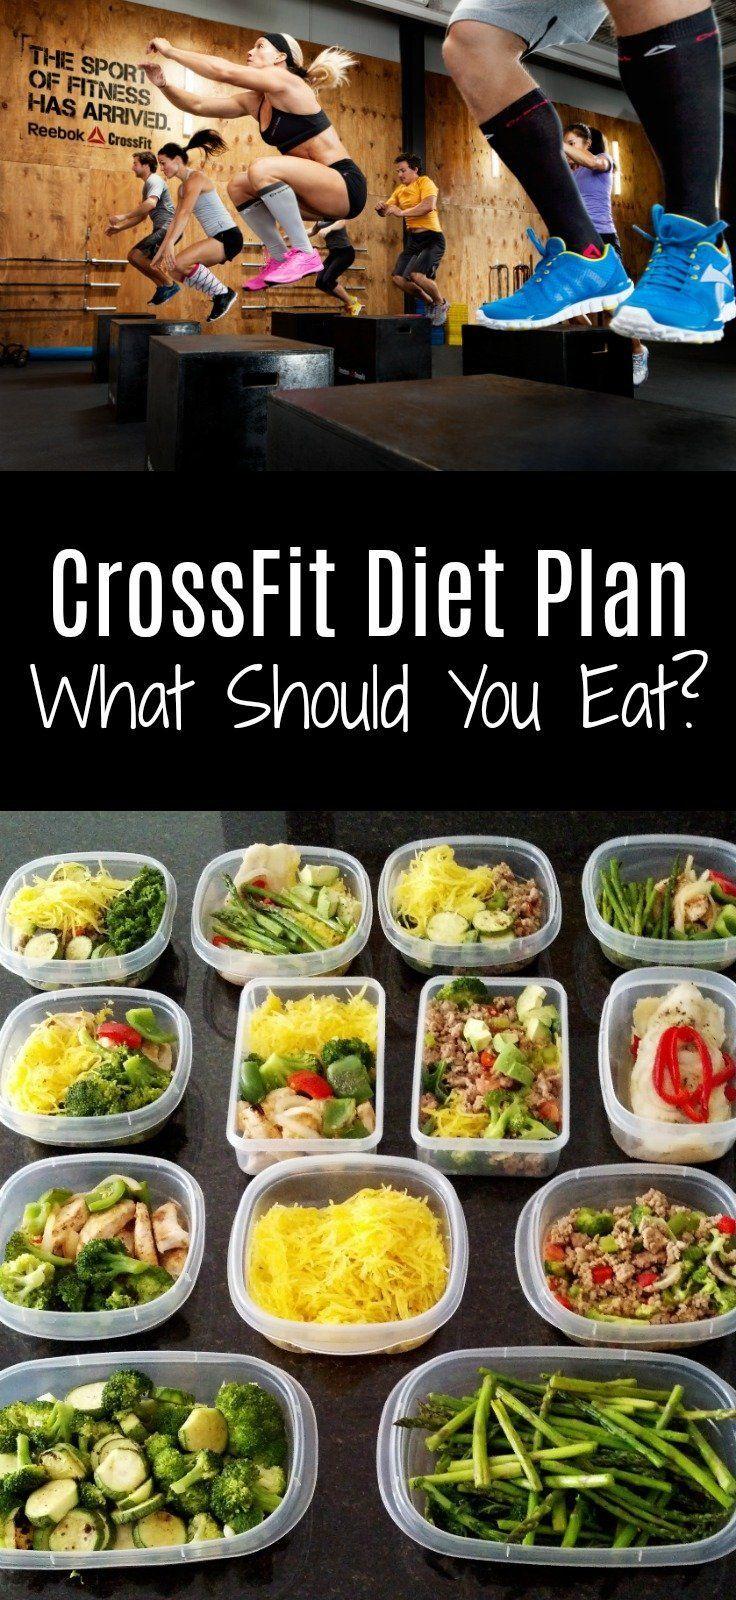 Crossfit Diet Plan What Should You Eat Crossfit Diet Crossfit Diet Plan Healthy Diet Tips